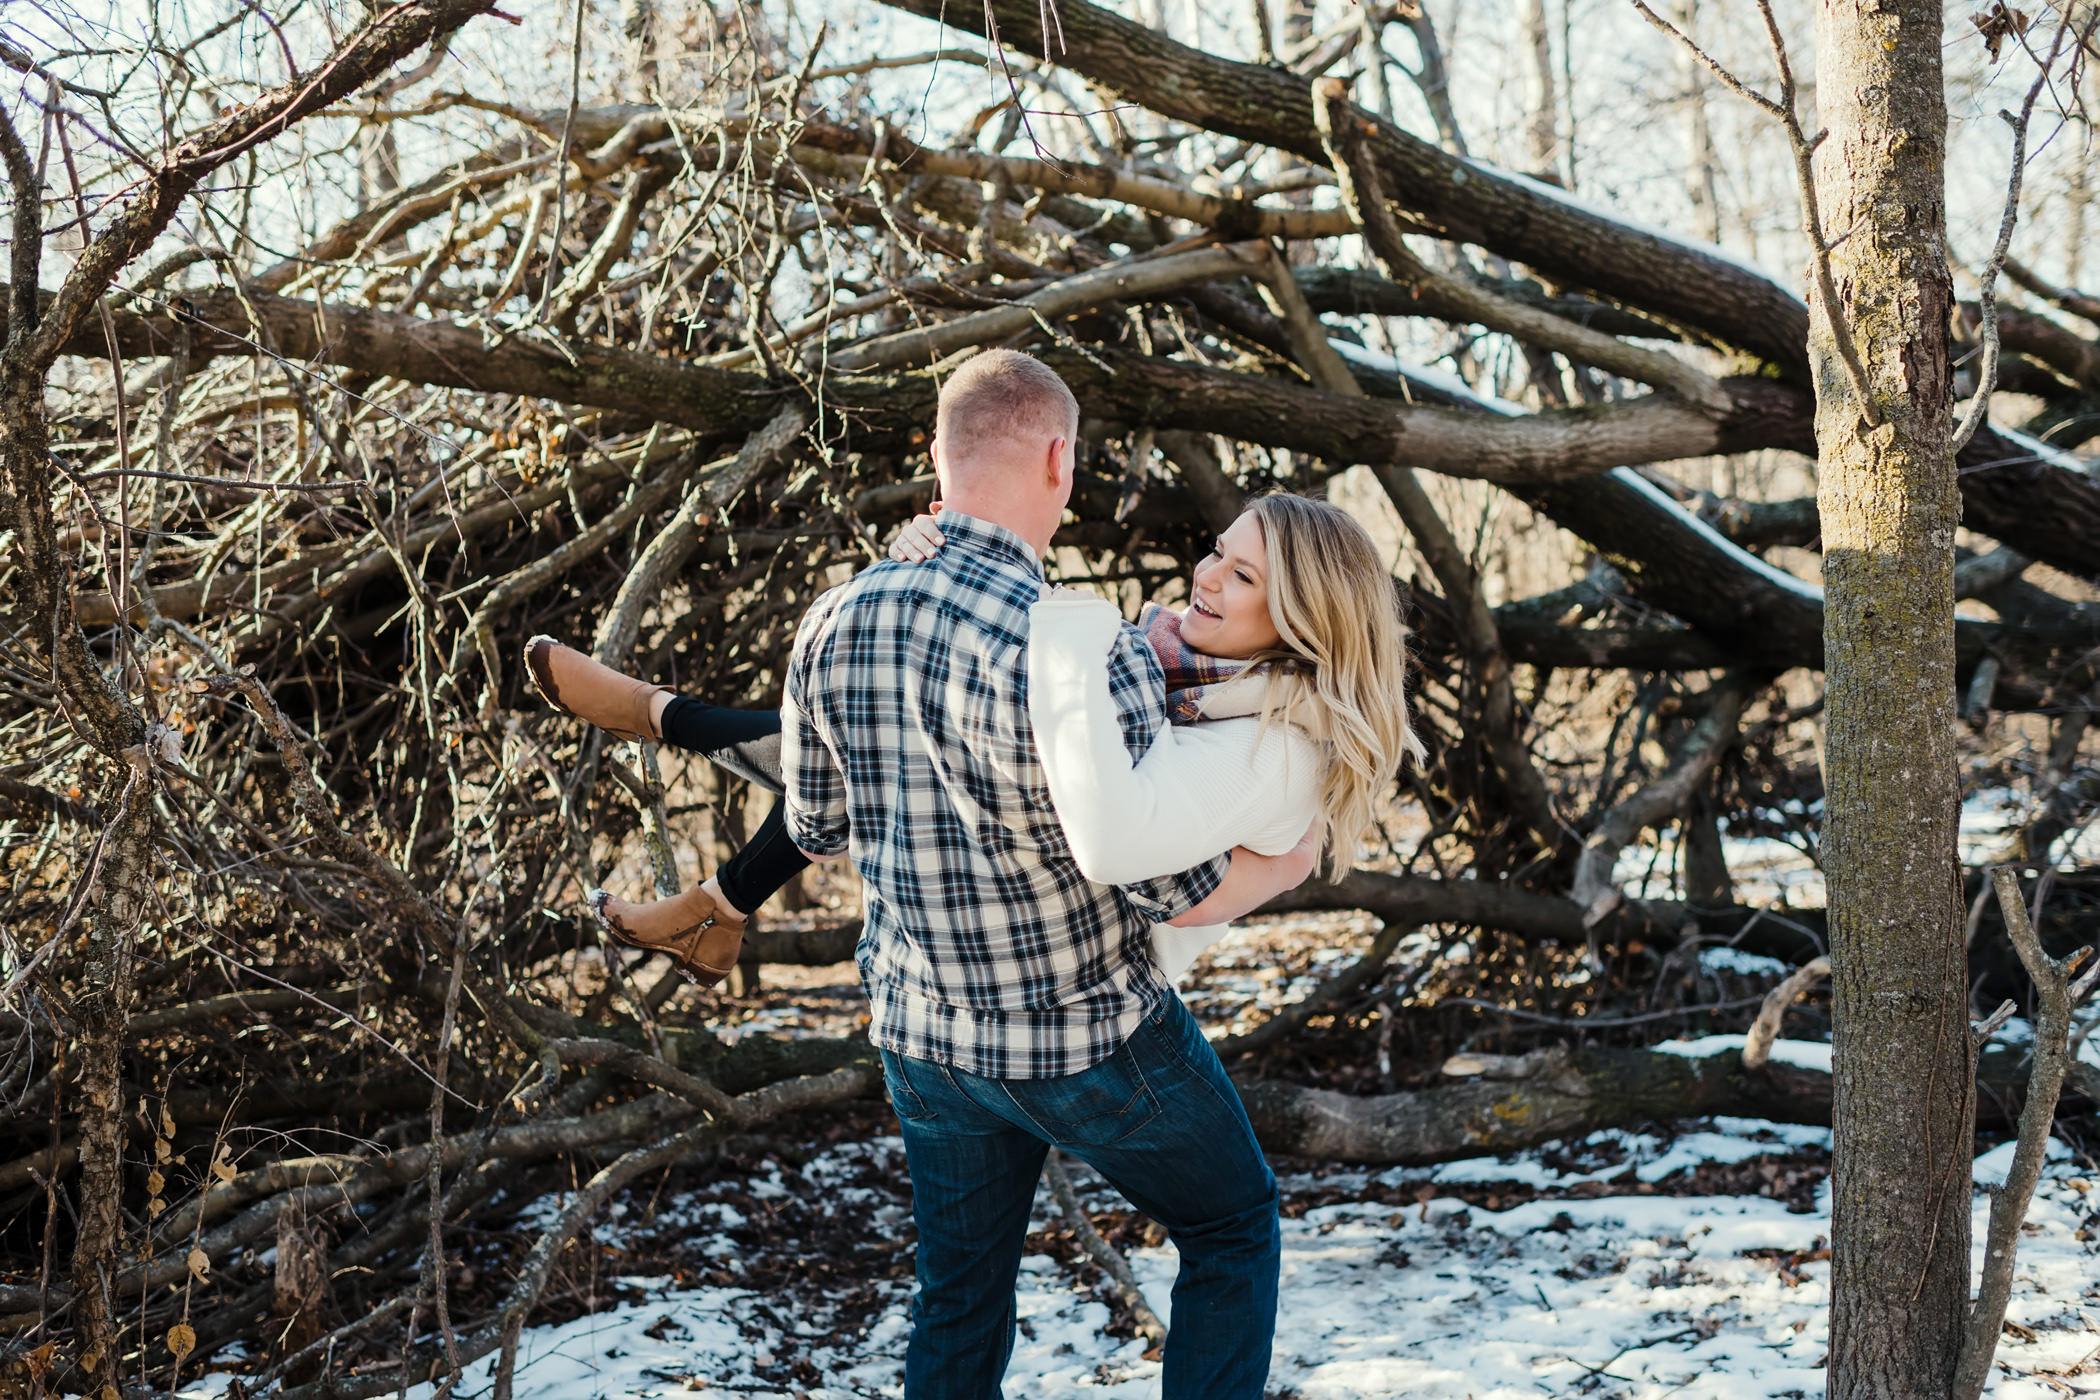 Man carries his fiancé